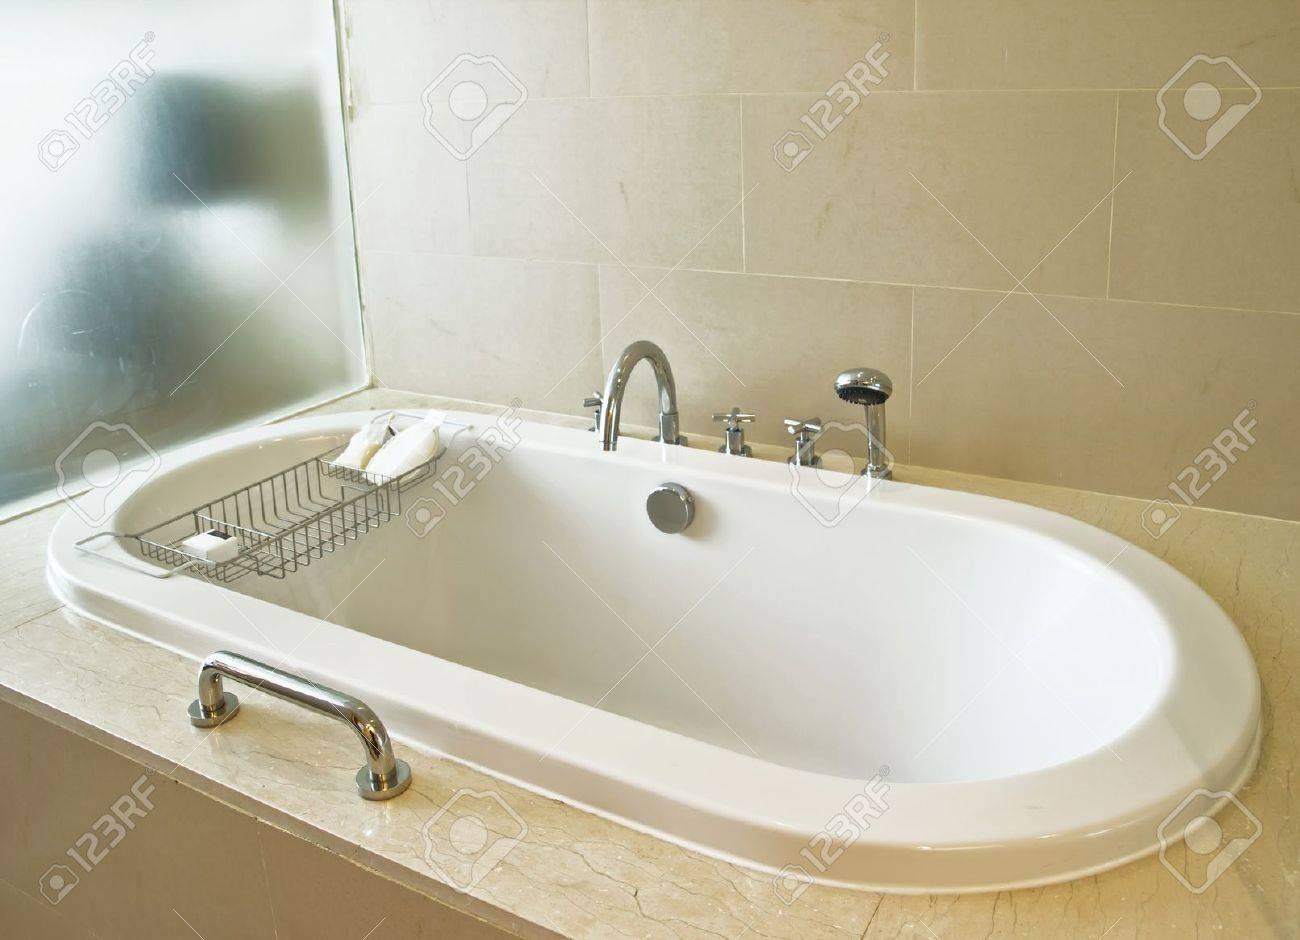 bath tub Stock Photo - 9312573